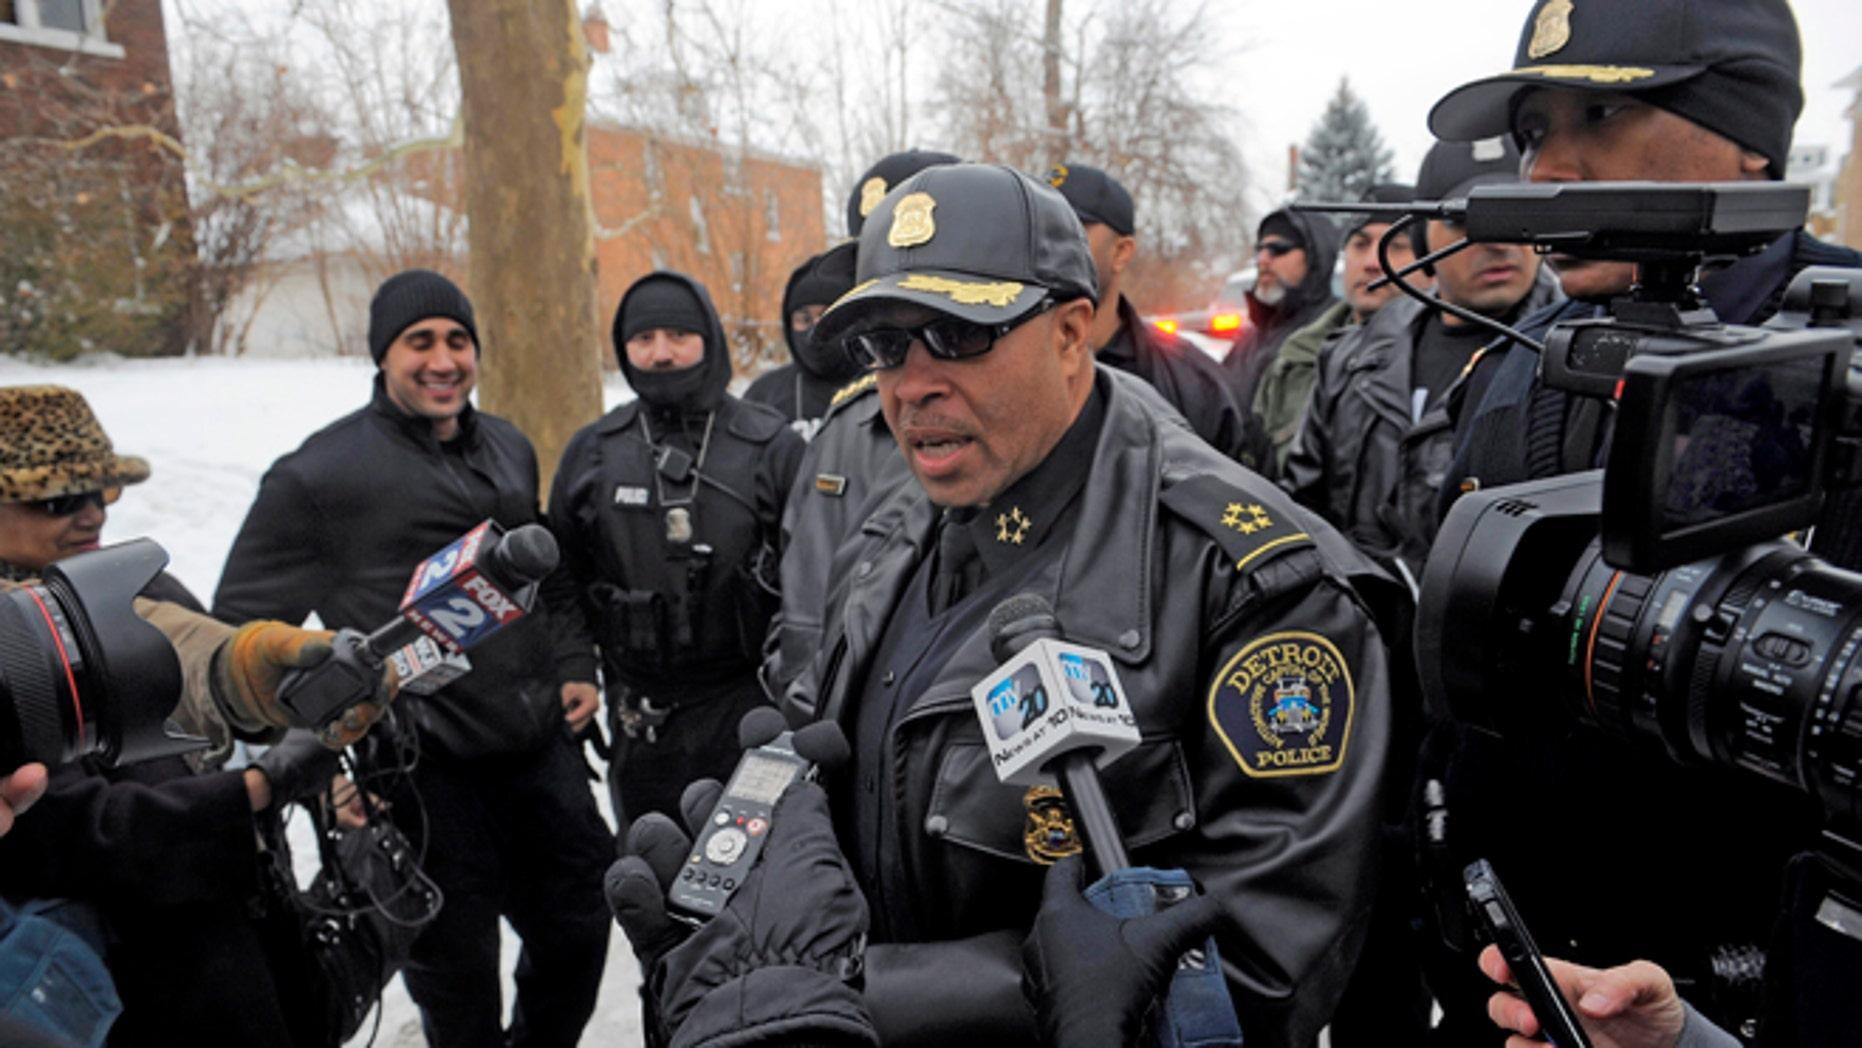 Dec. 17, 2013: Detroit Police Chief James Craig speaks with the media during Operation Mistletoe, a raid targeting drug dealers on  Detroit's west side.